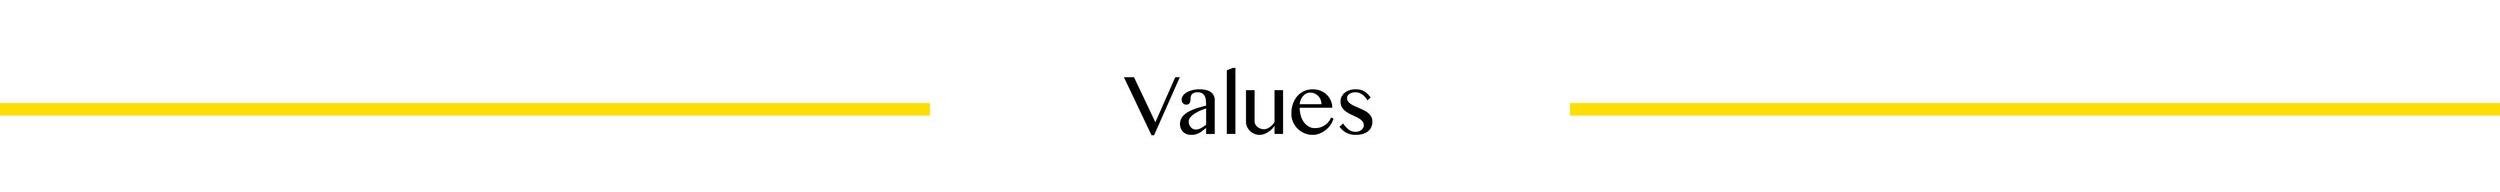 Website title blocks values.jpg